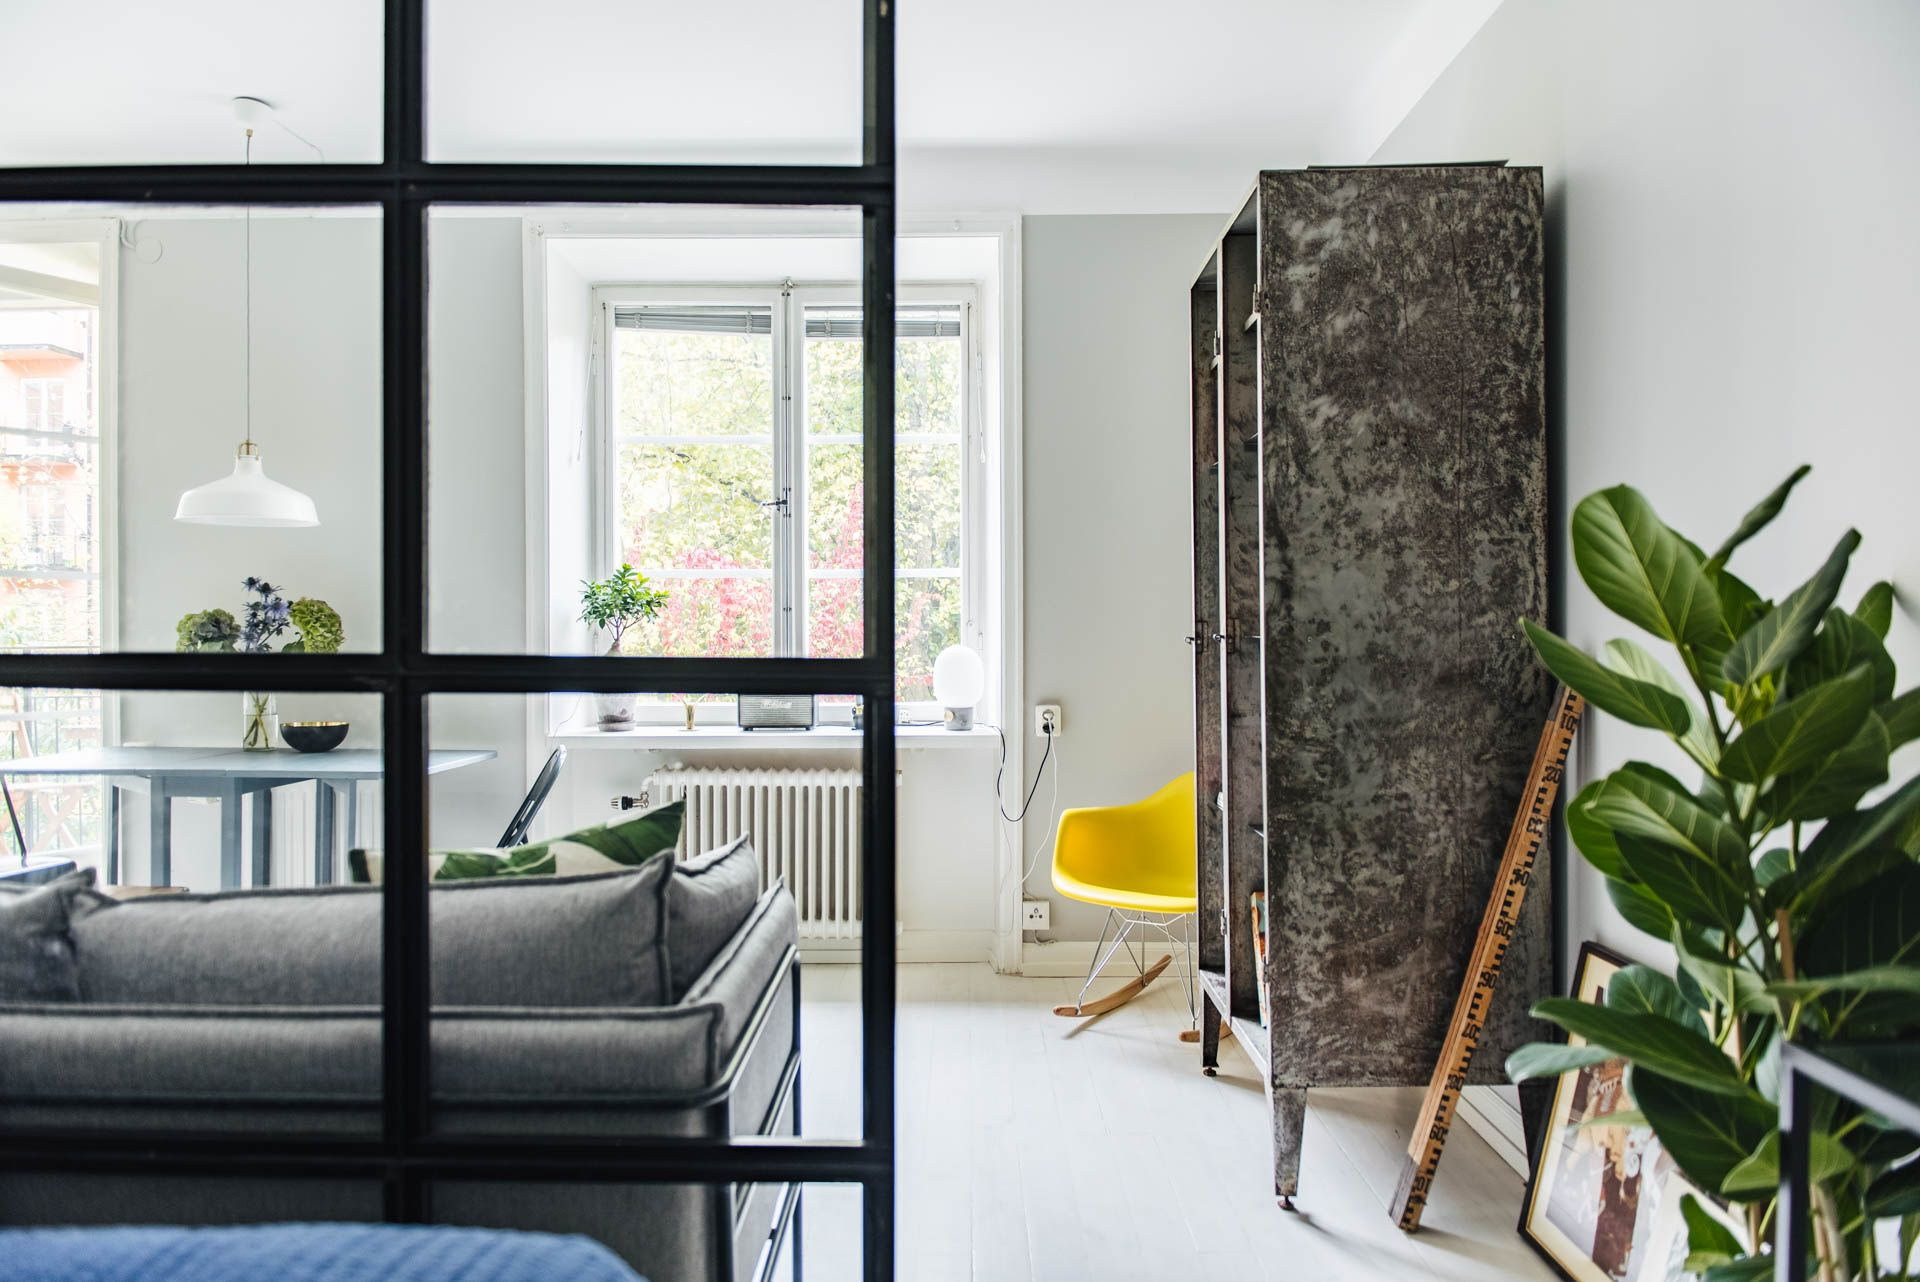 Stoere Industriele Loft : Stoere mini loft van 38m2! interieur pinterest ideal home